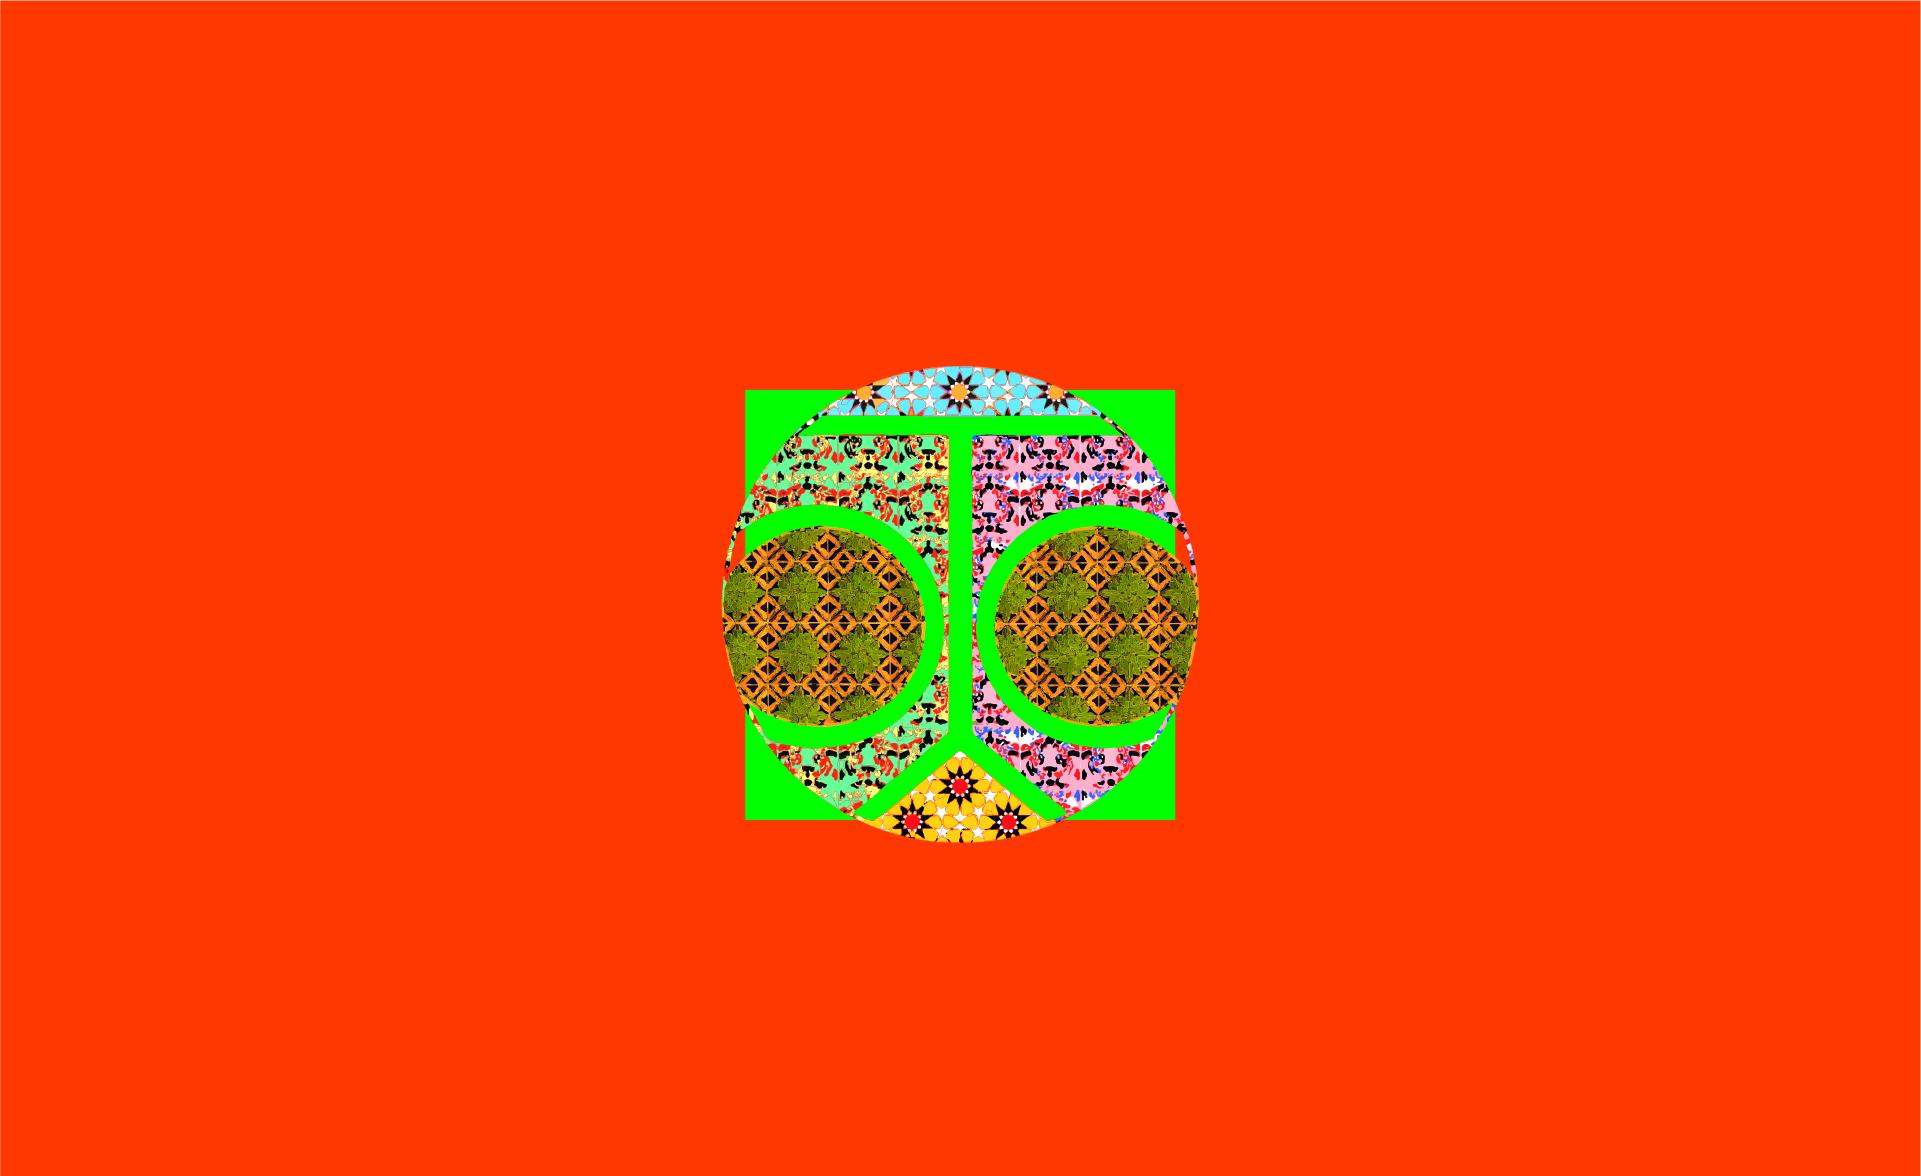 Asset 15 logo green square on orange.jpg